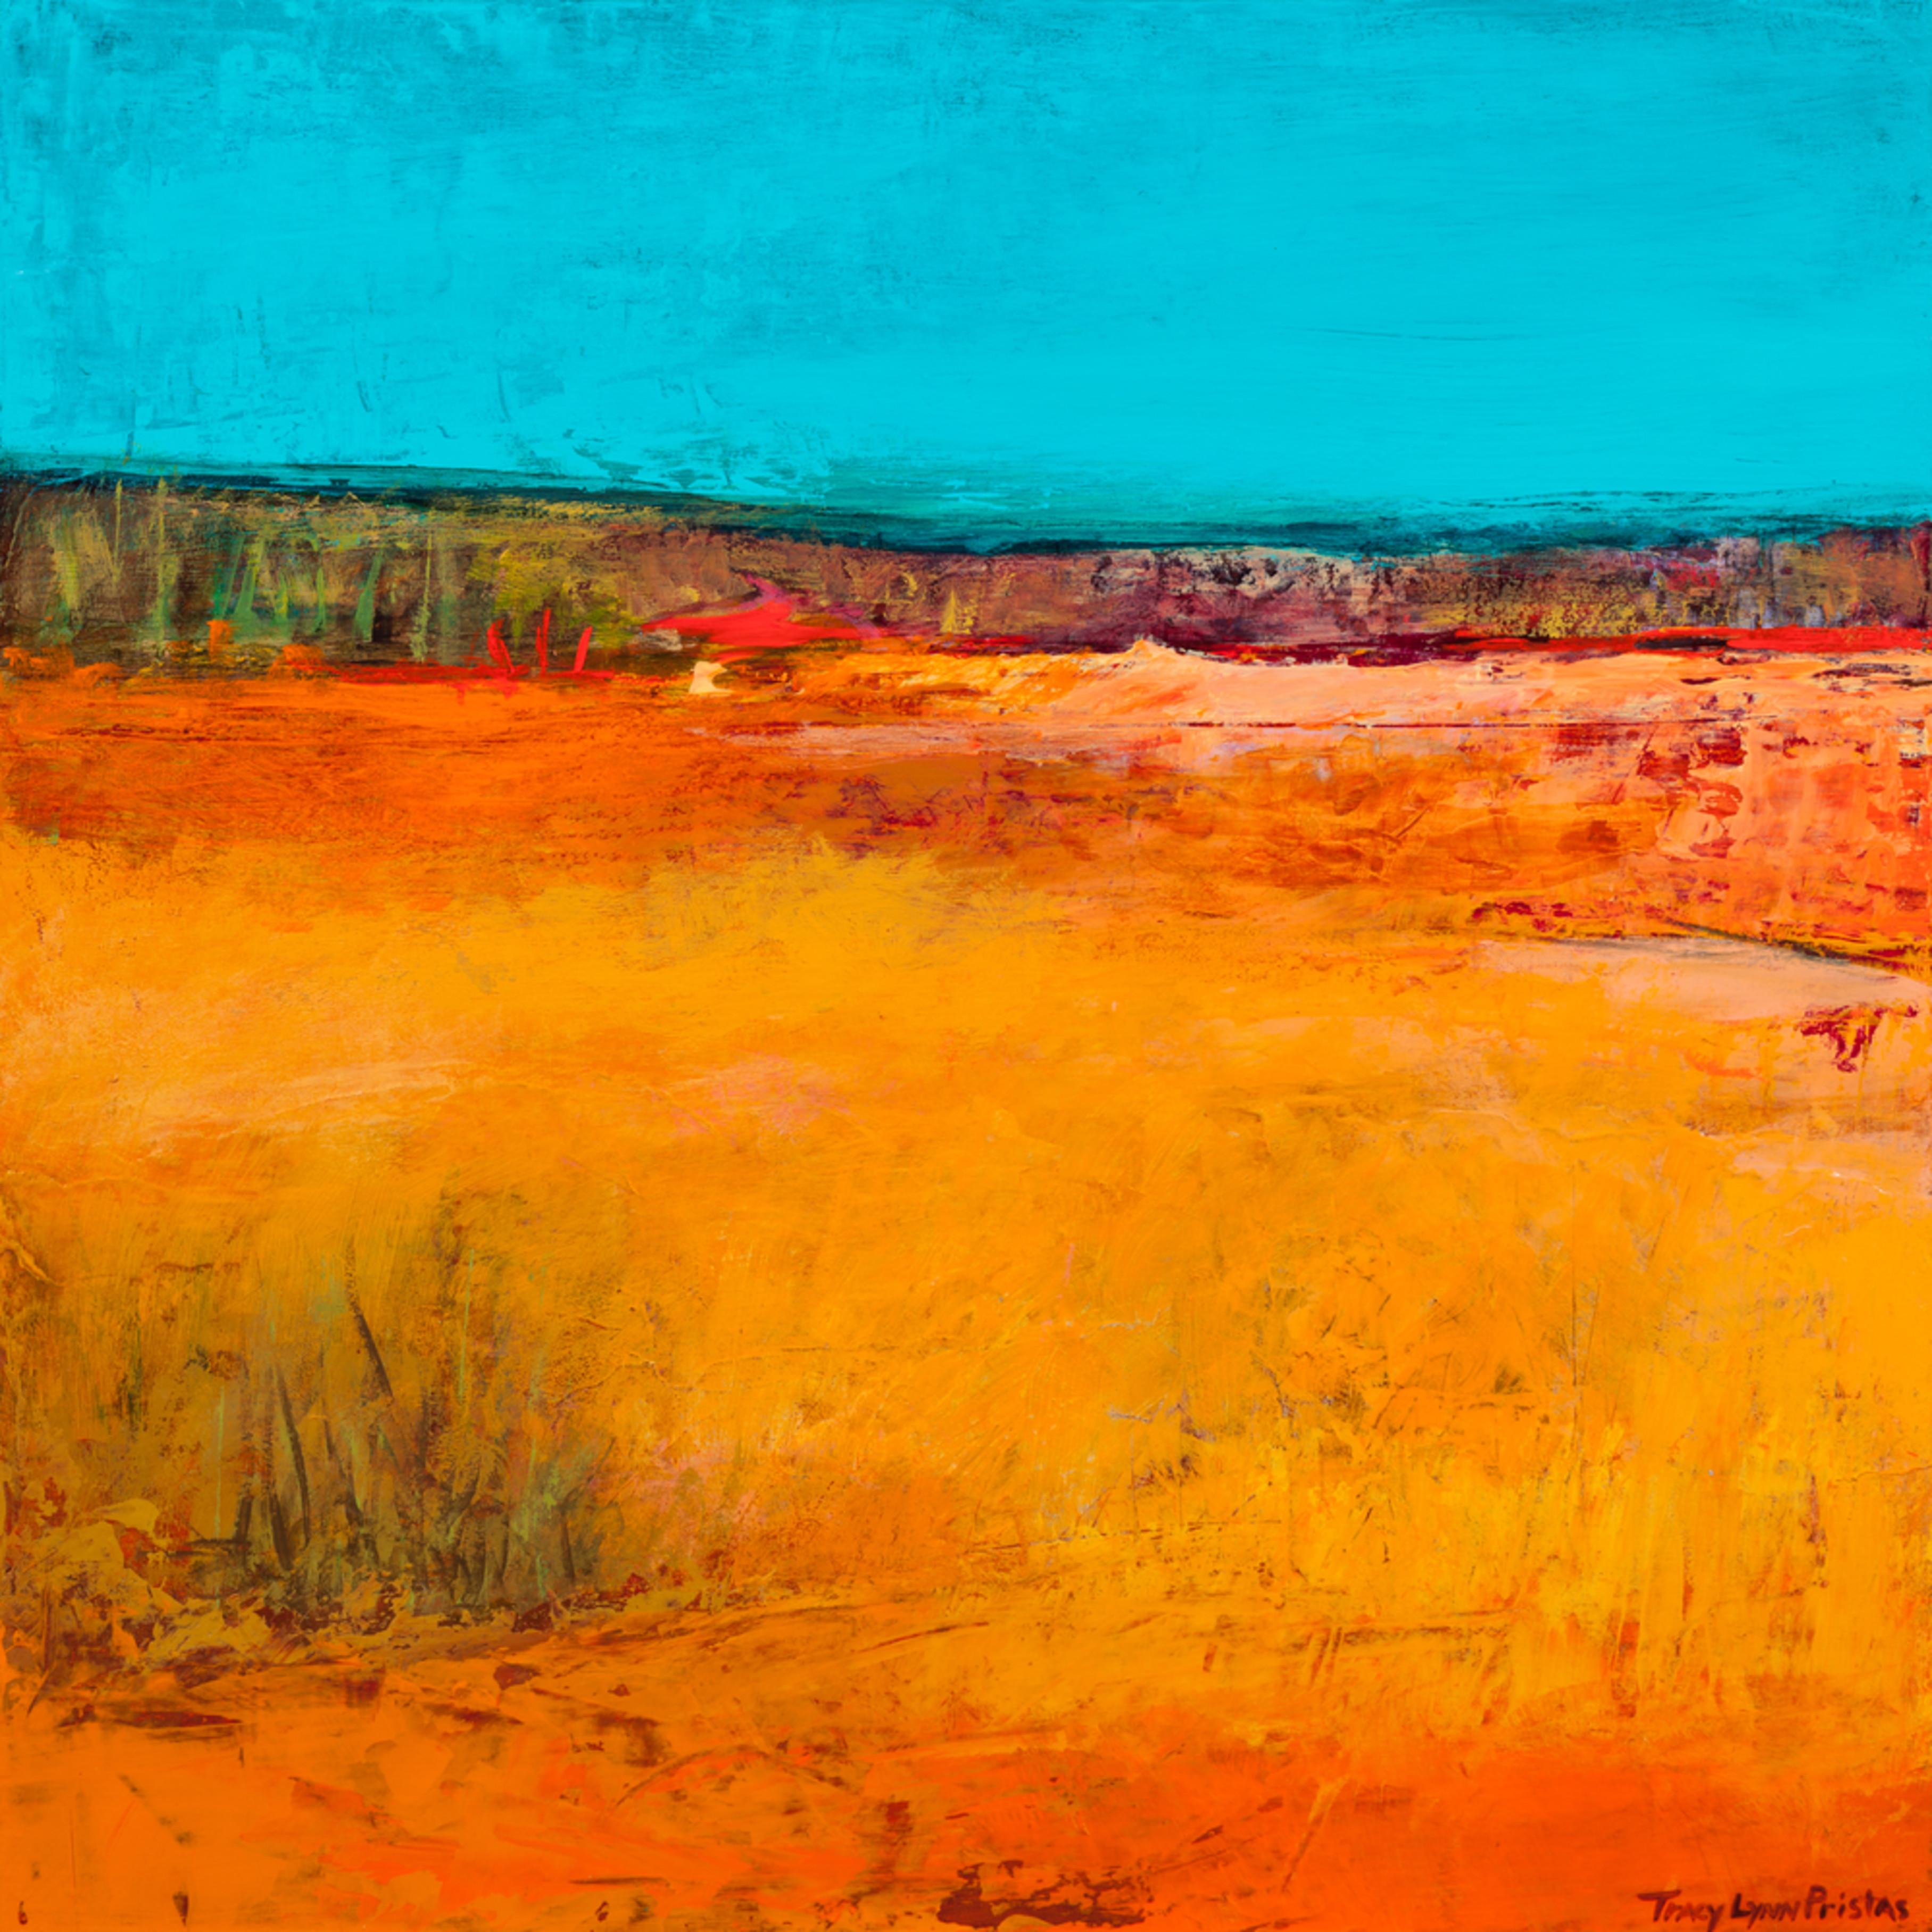 Tracy lynn pristas abstract landscape paintings  playa artist residency erzycn